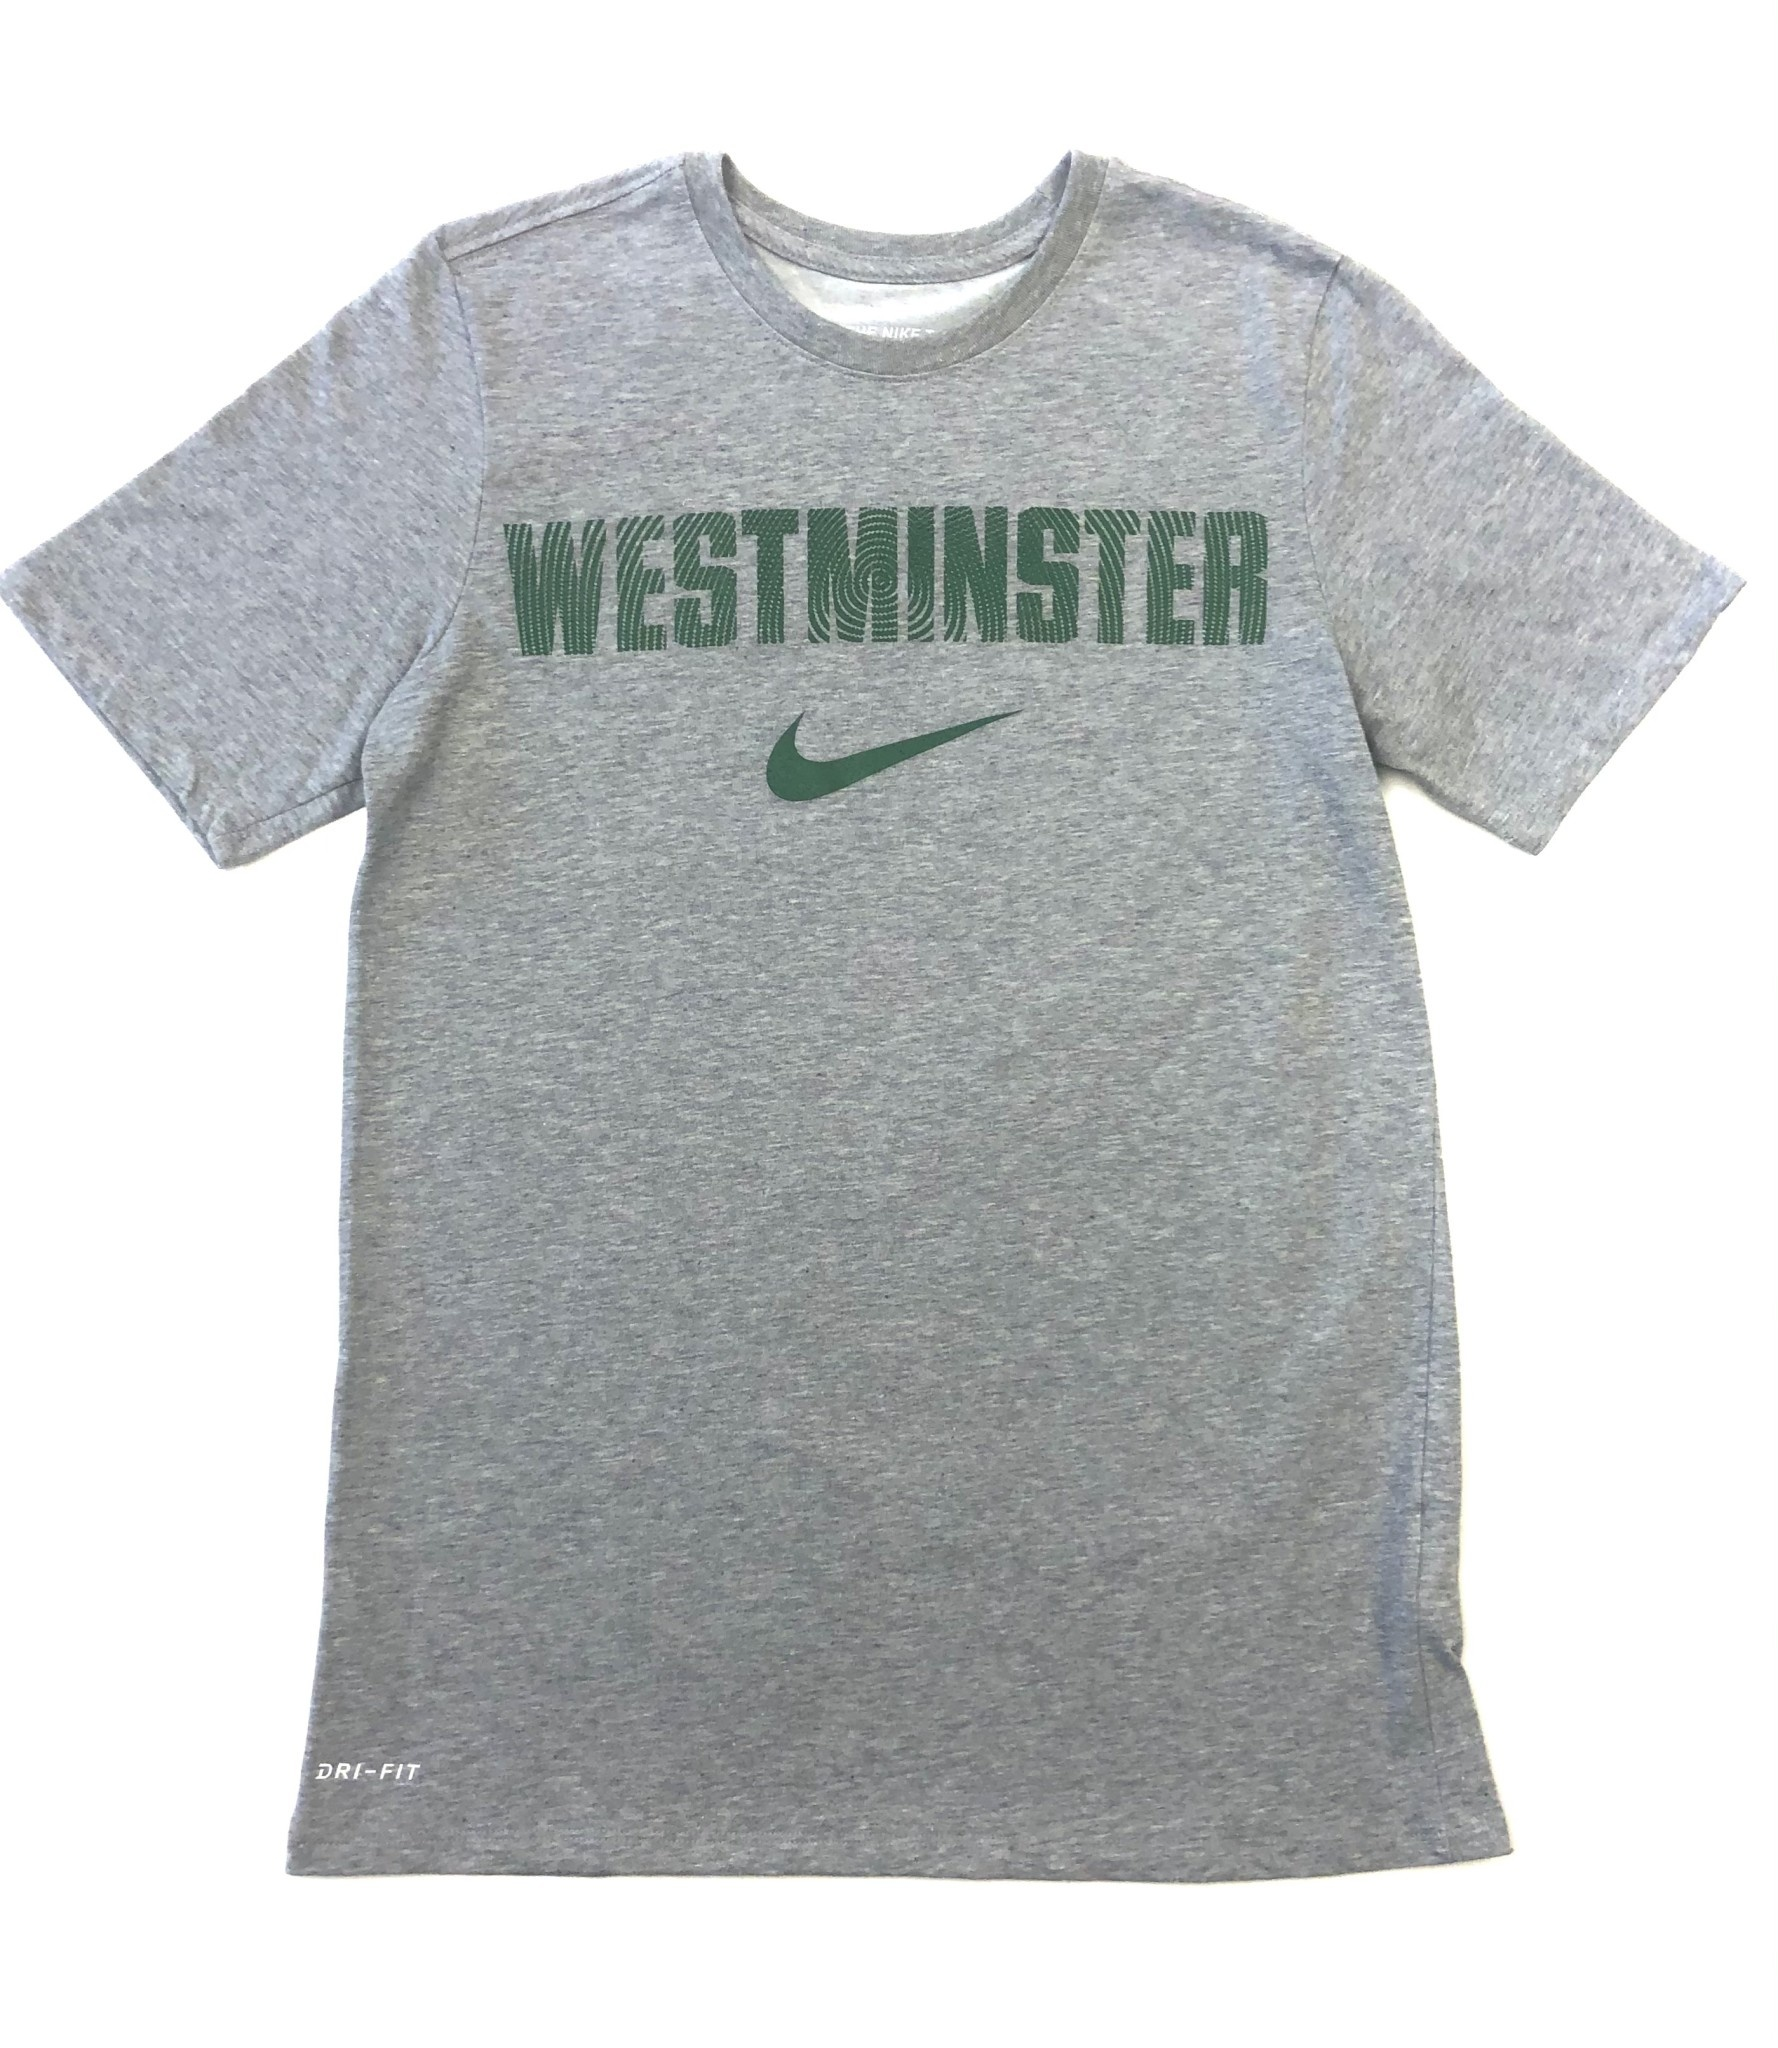 Nike T: Nike Dri-fit Cotton SS Gray w/green lettering